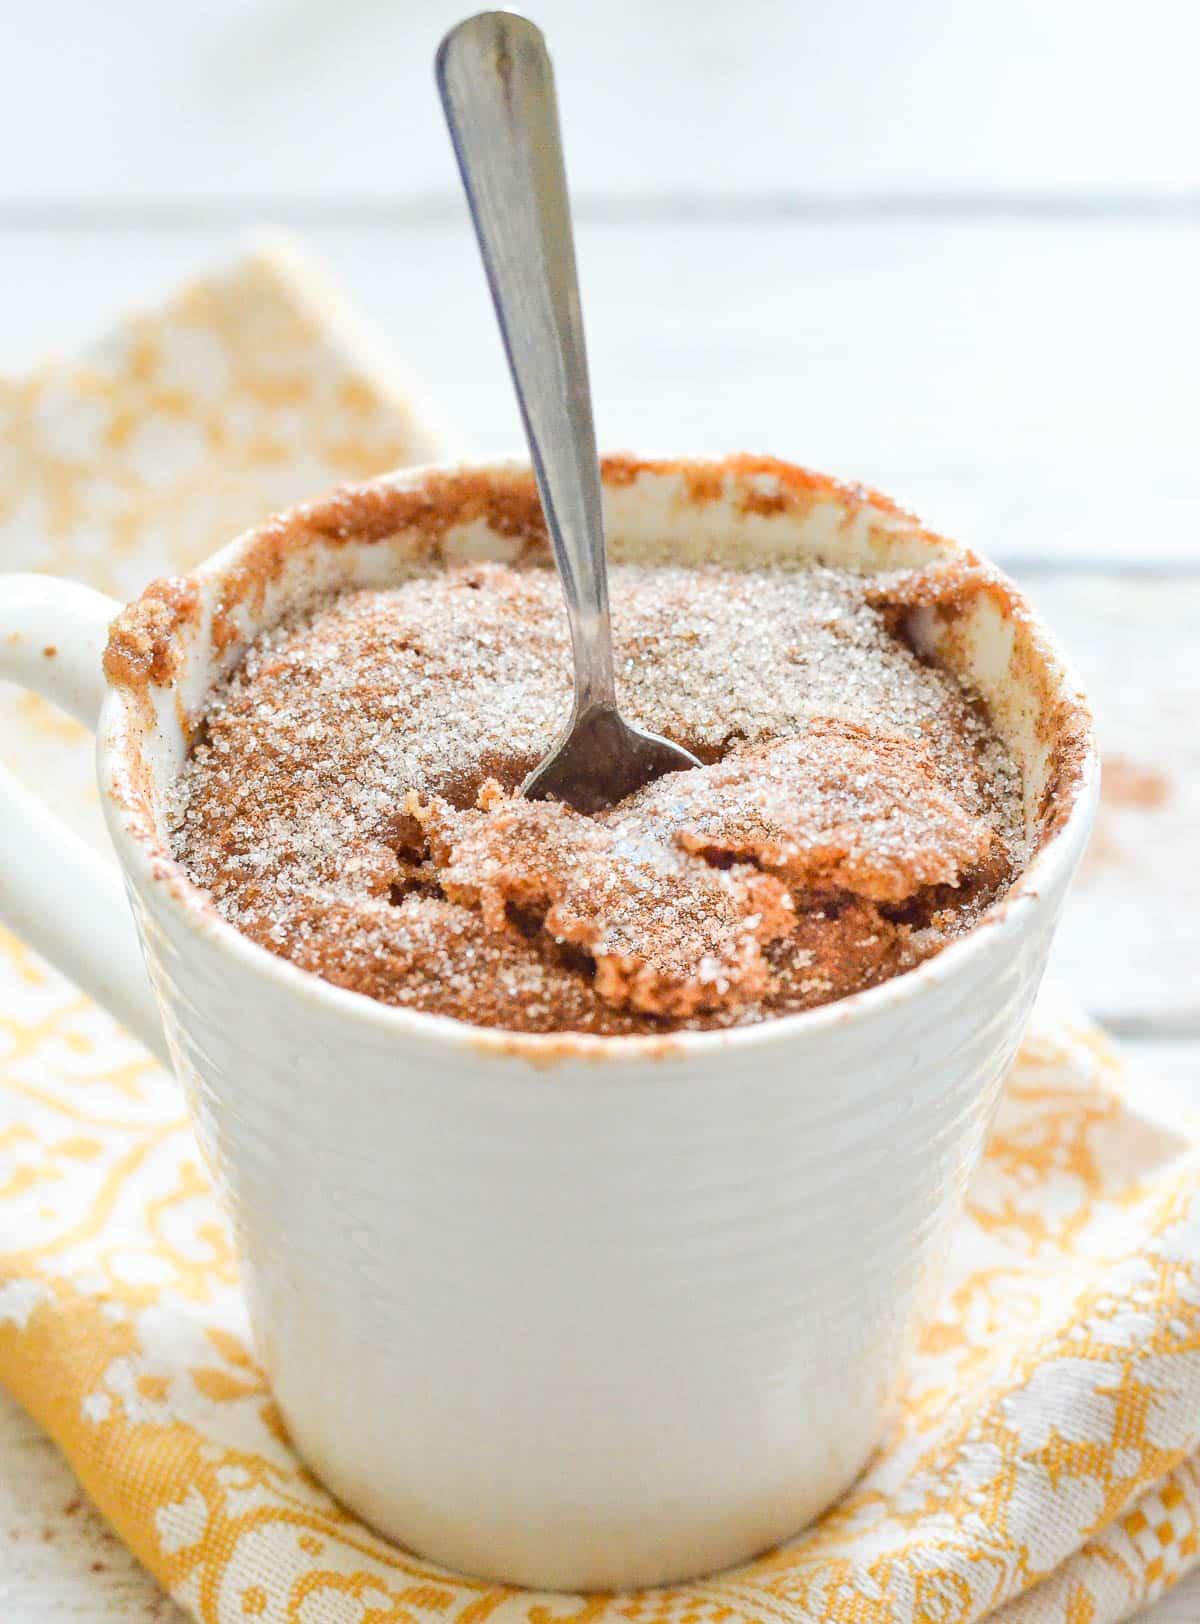 25 of the best mug cake recipes - A Mummy Too